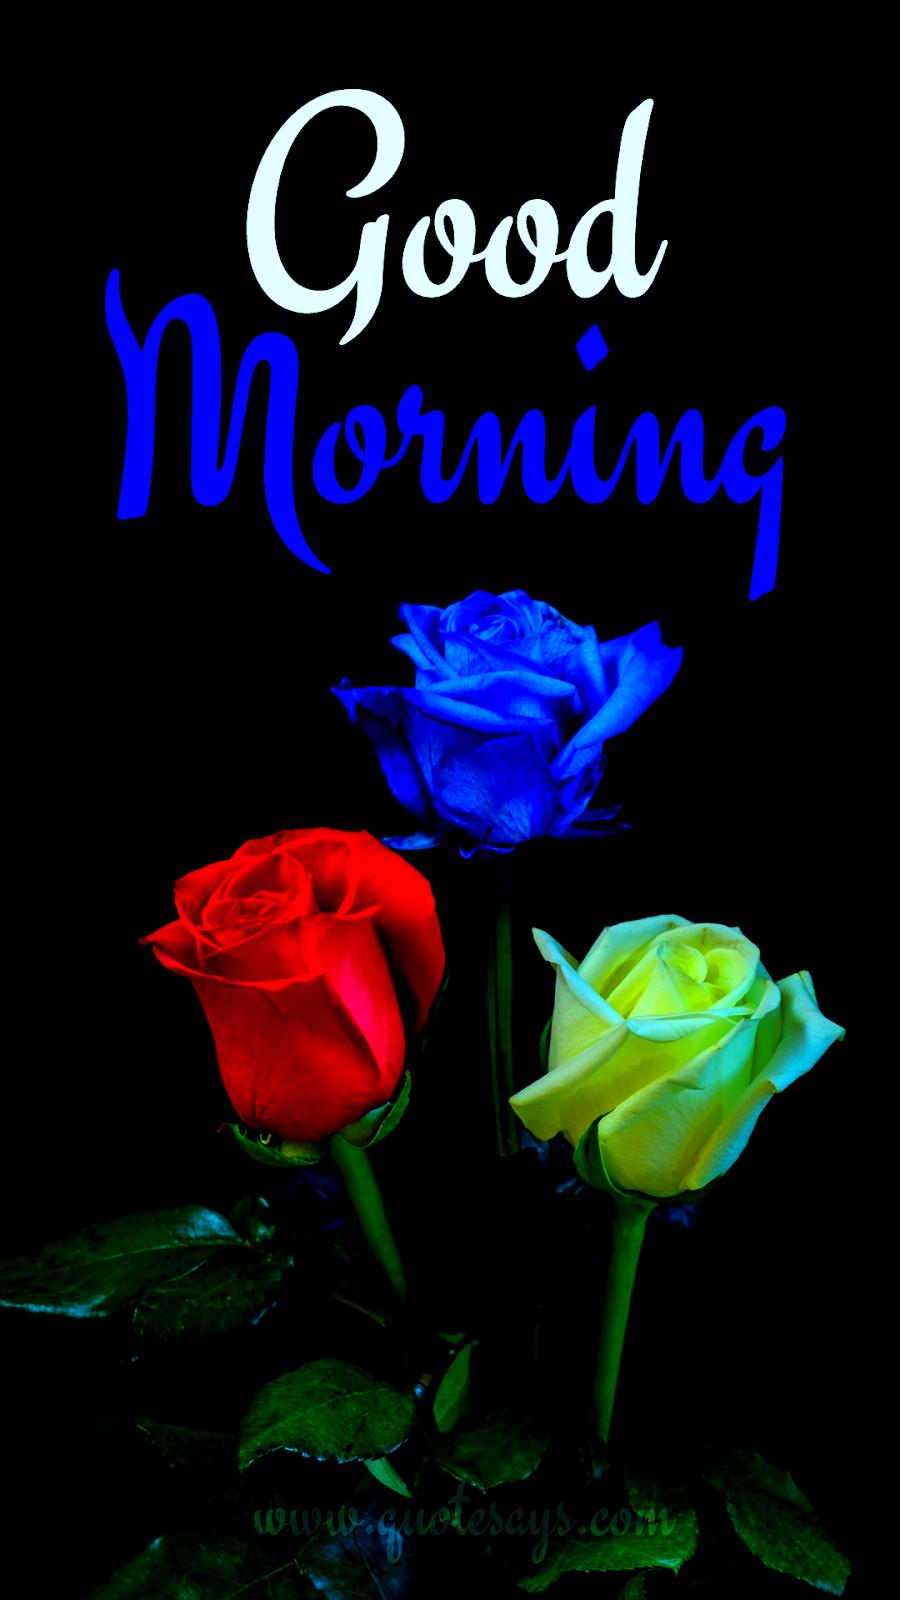 Good Morning Three Rose Flowers